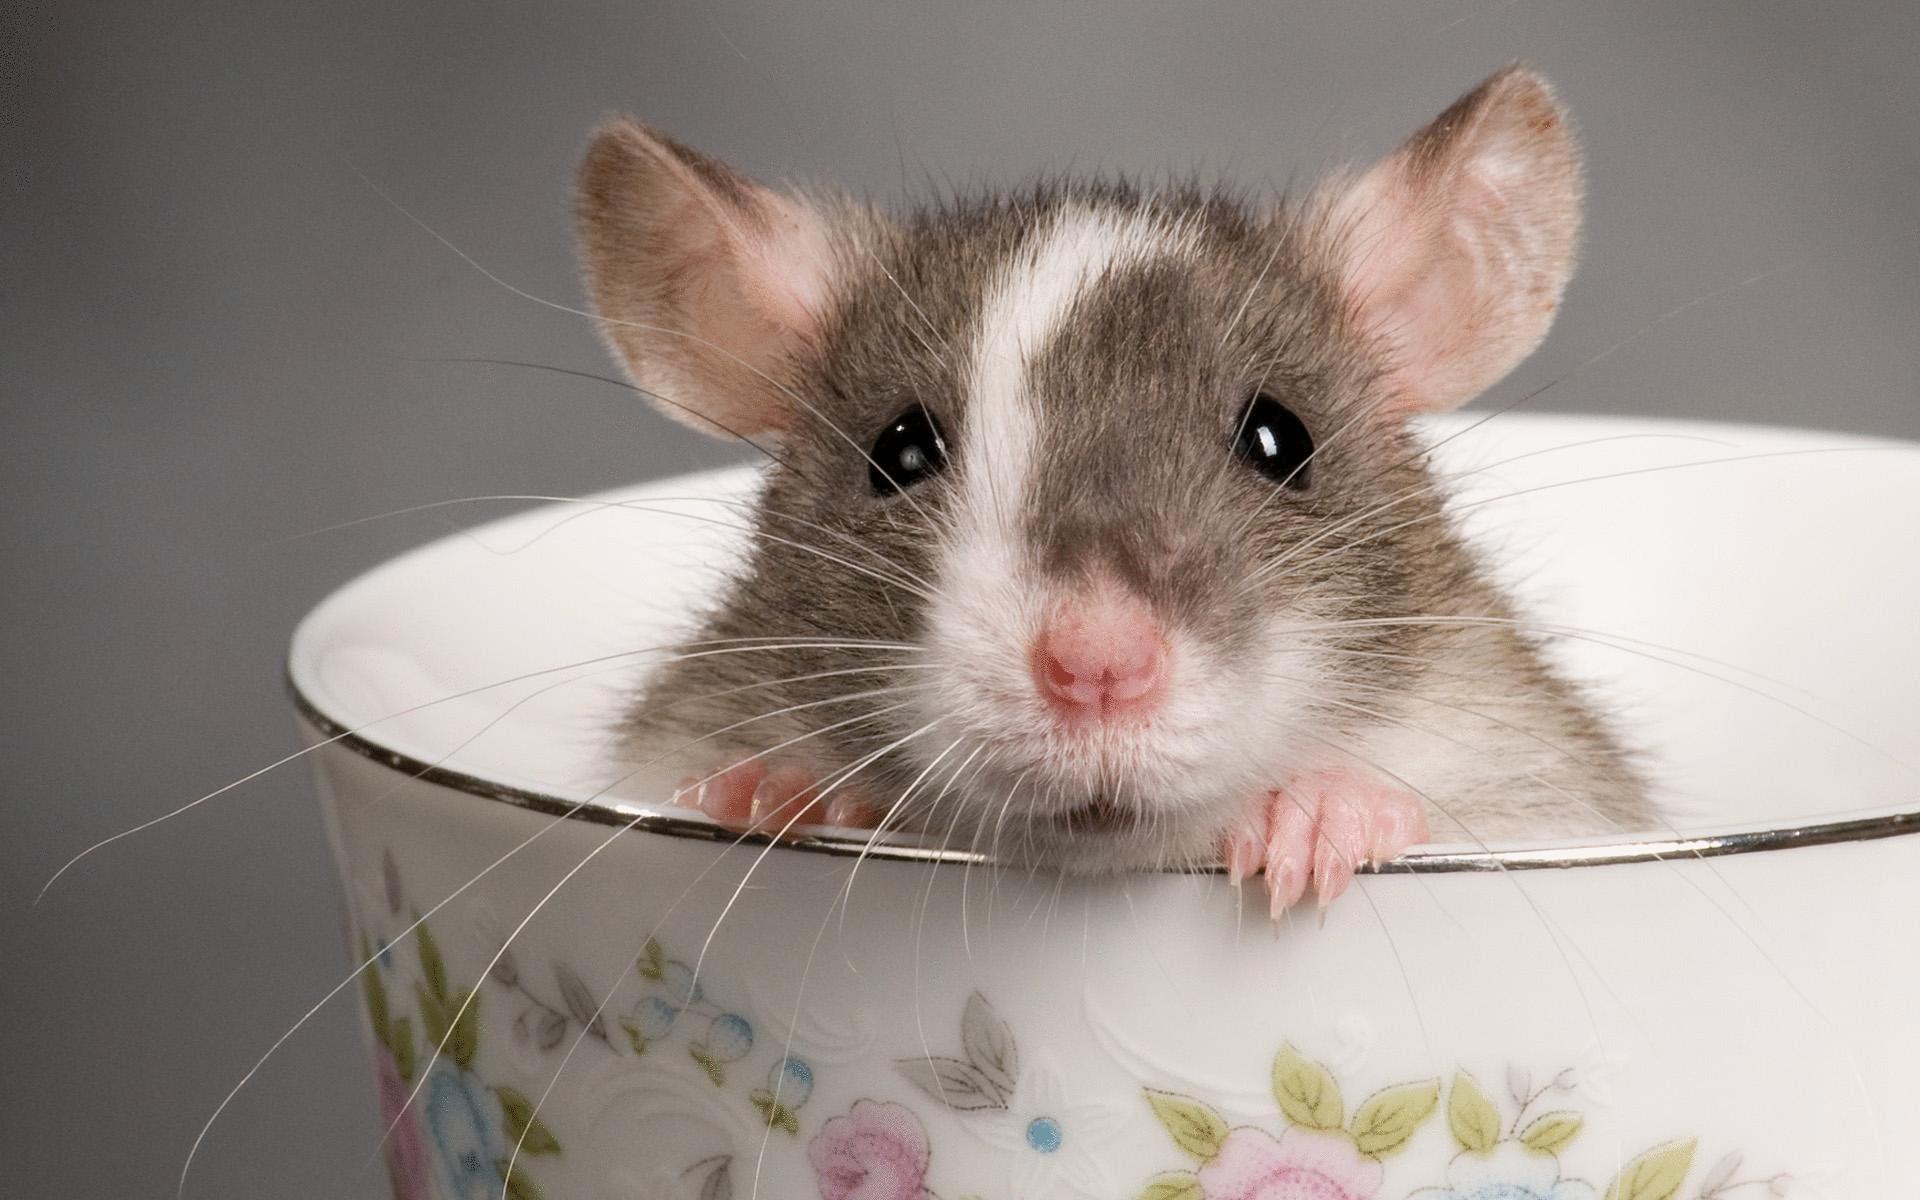 крысу во сне